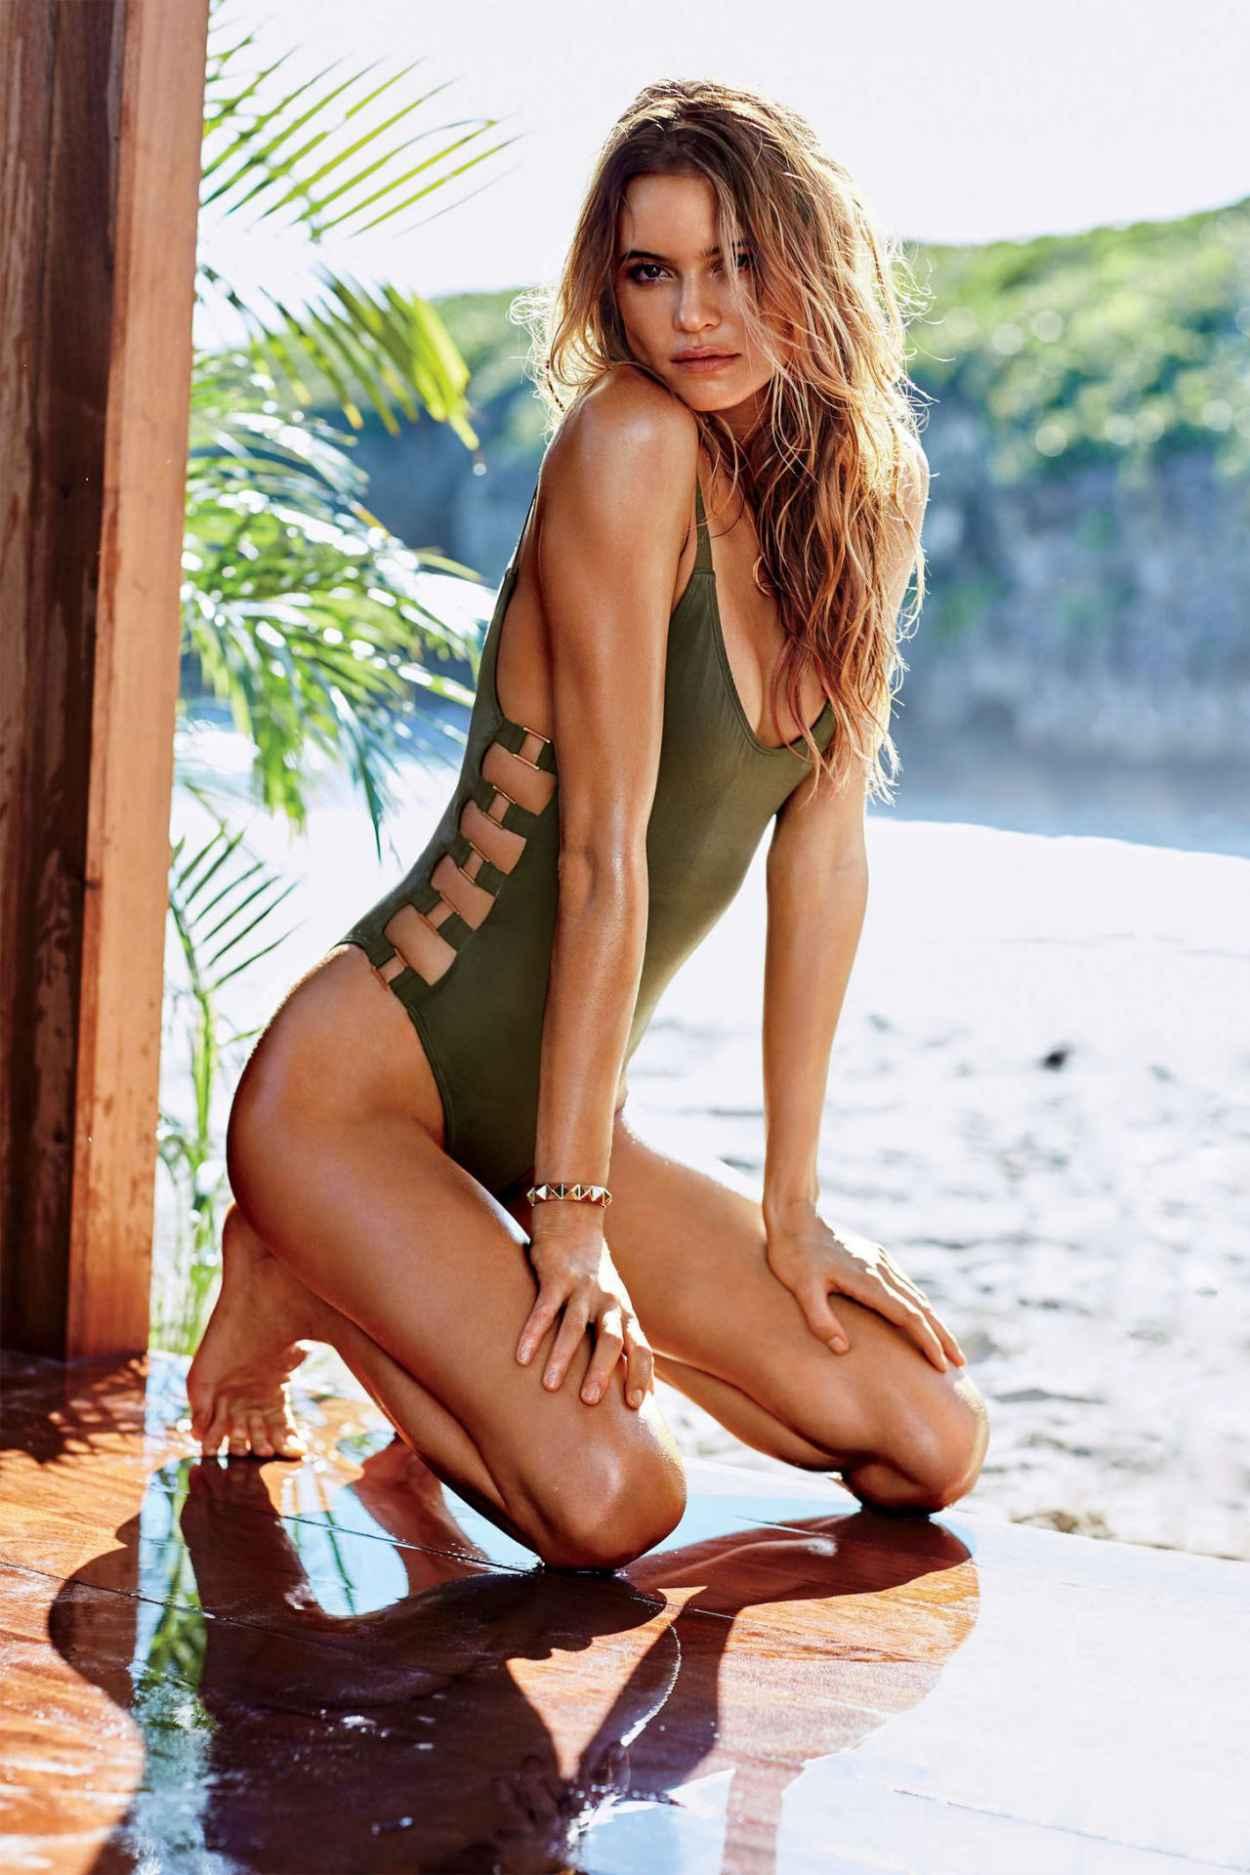 Behati Prinsloo Bikini Pics - Victoria-s Secret Swim Catalog 2015-5